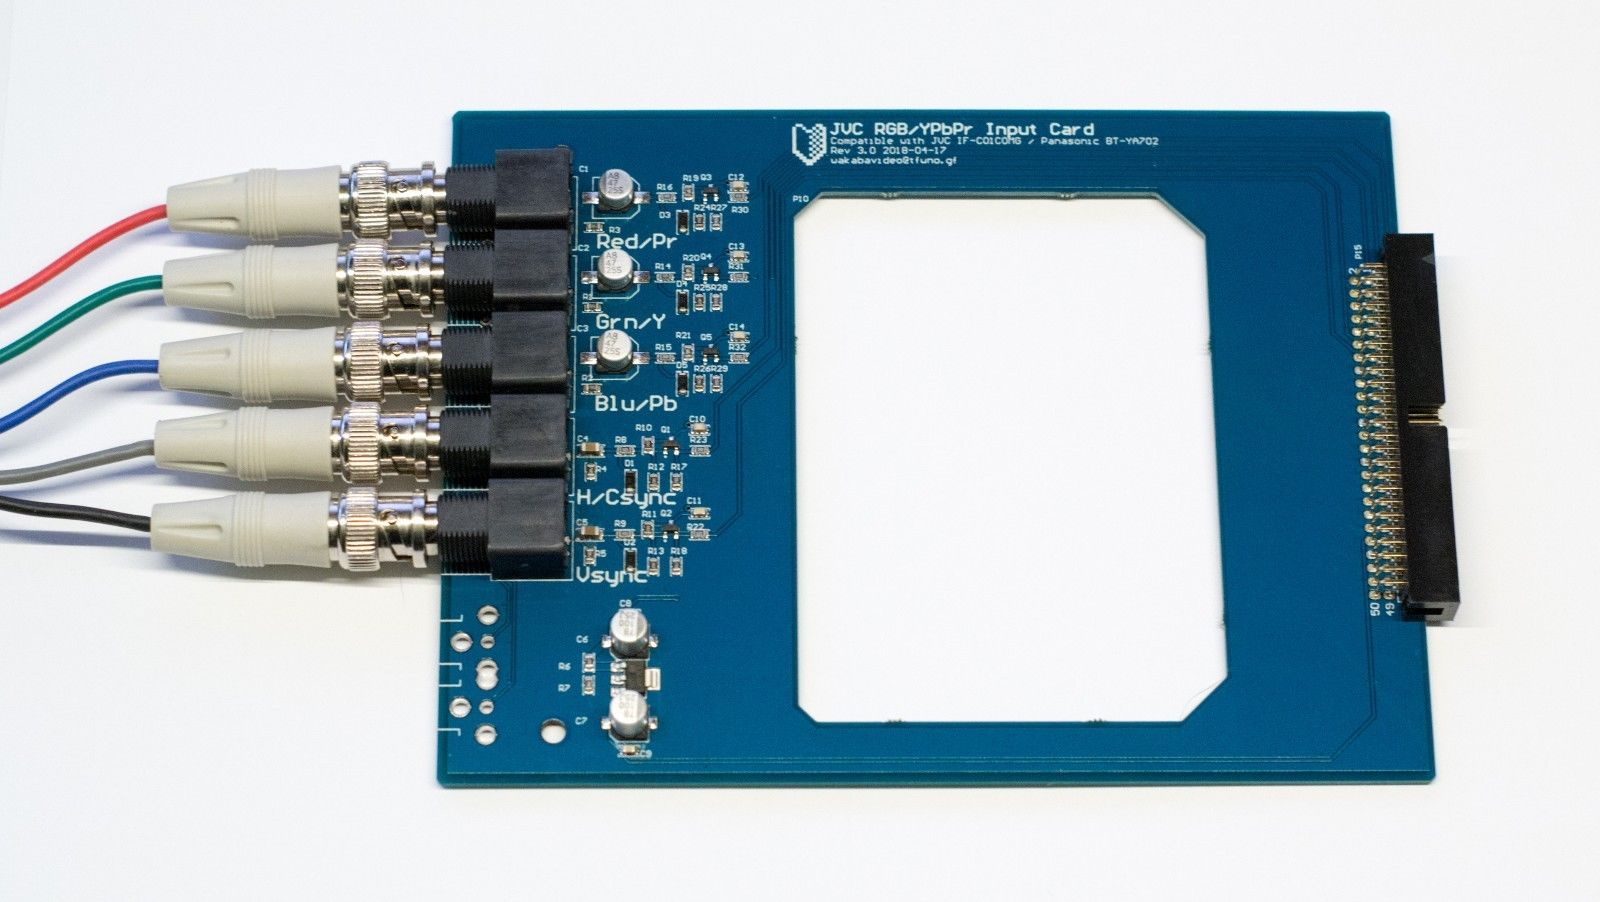 Aftermarket RGB Input card for someJVC, Panasonic and Ikegami RGB monitors